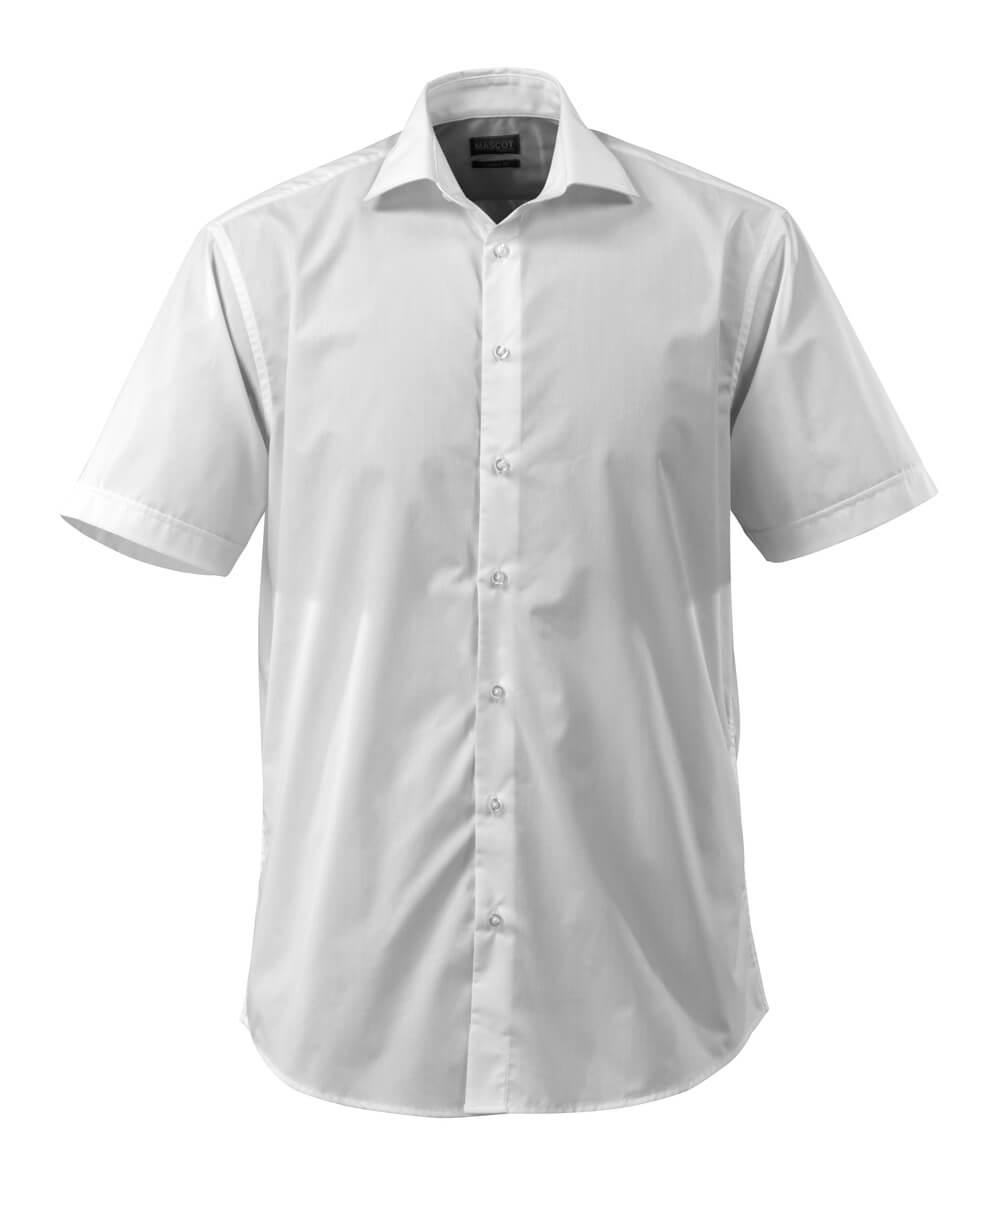 50632-984-06 Camisa, manga corta - blanco